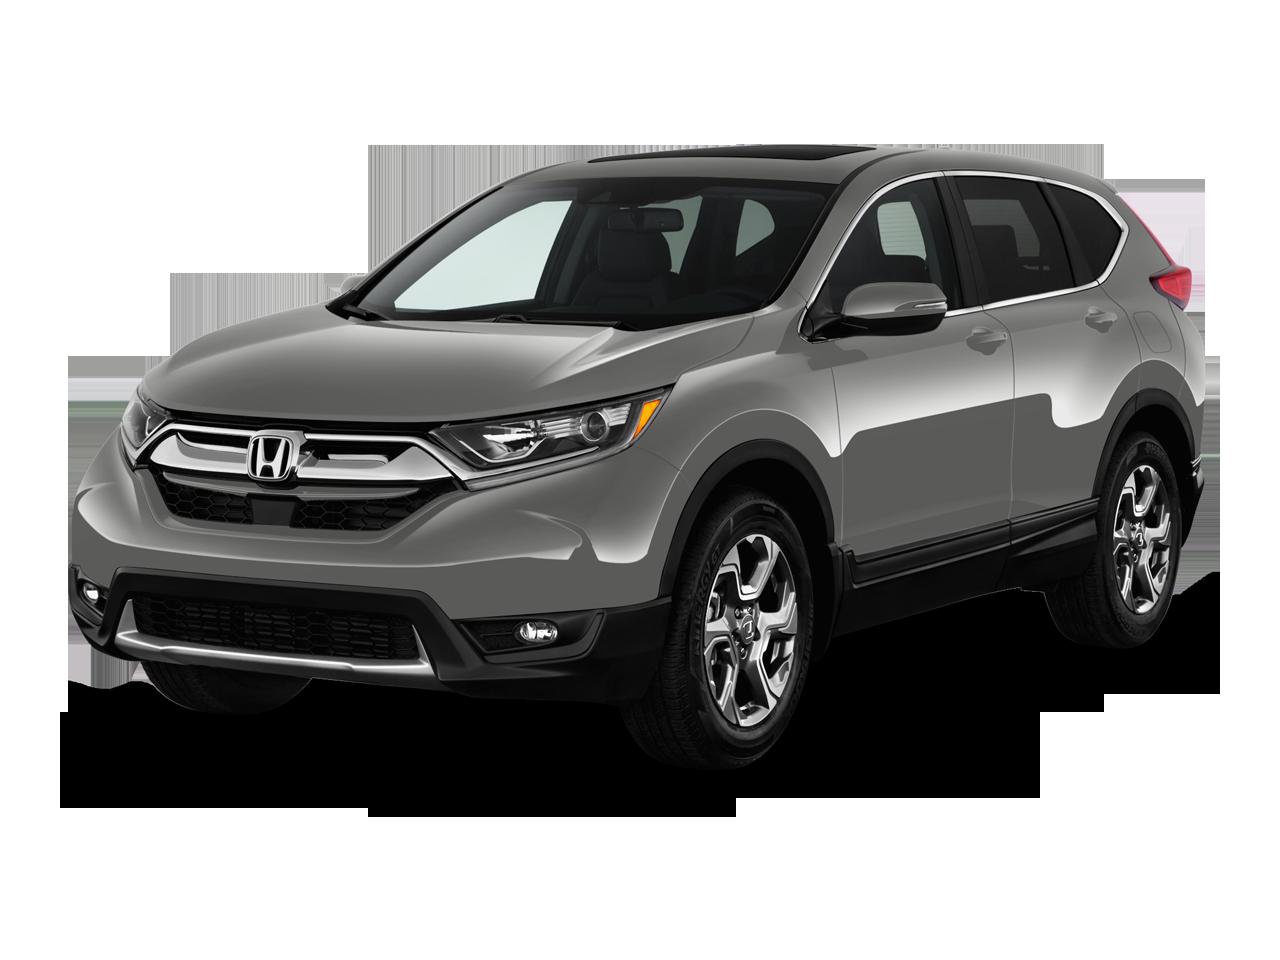 New 2017 Honda CR-V EX-L - Near Mount Morris PA - I-79 Honda